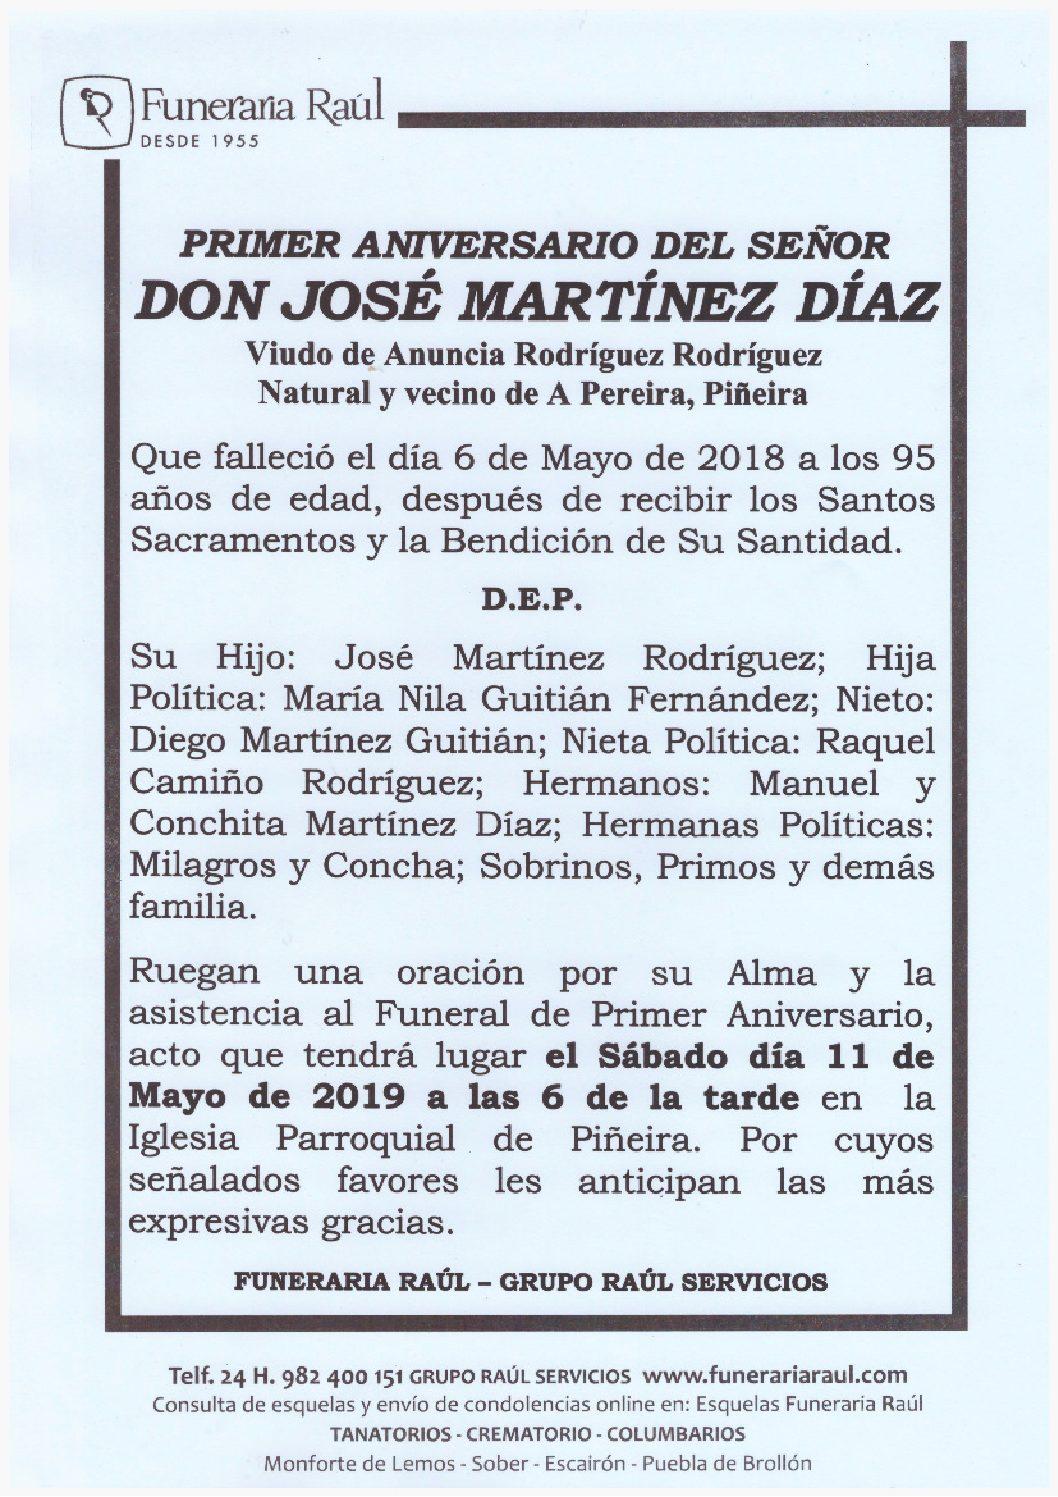 PRIMER ANIVERSARIO DEL SEÑOR DON JOSE MARTINEZ LOPEZ